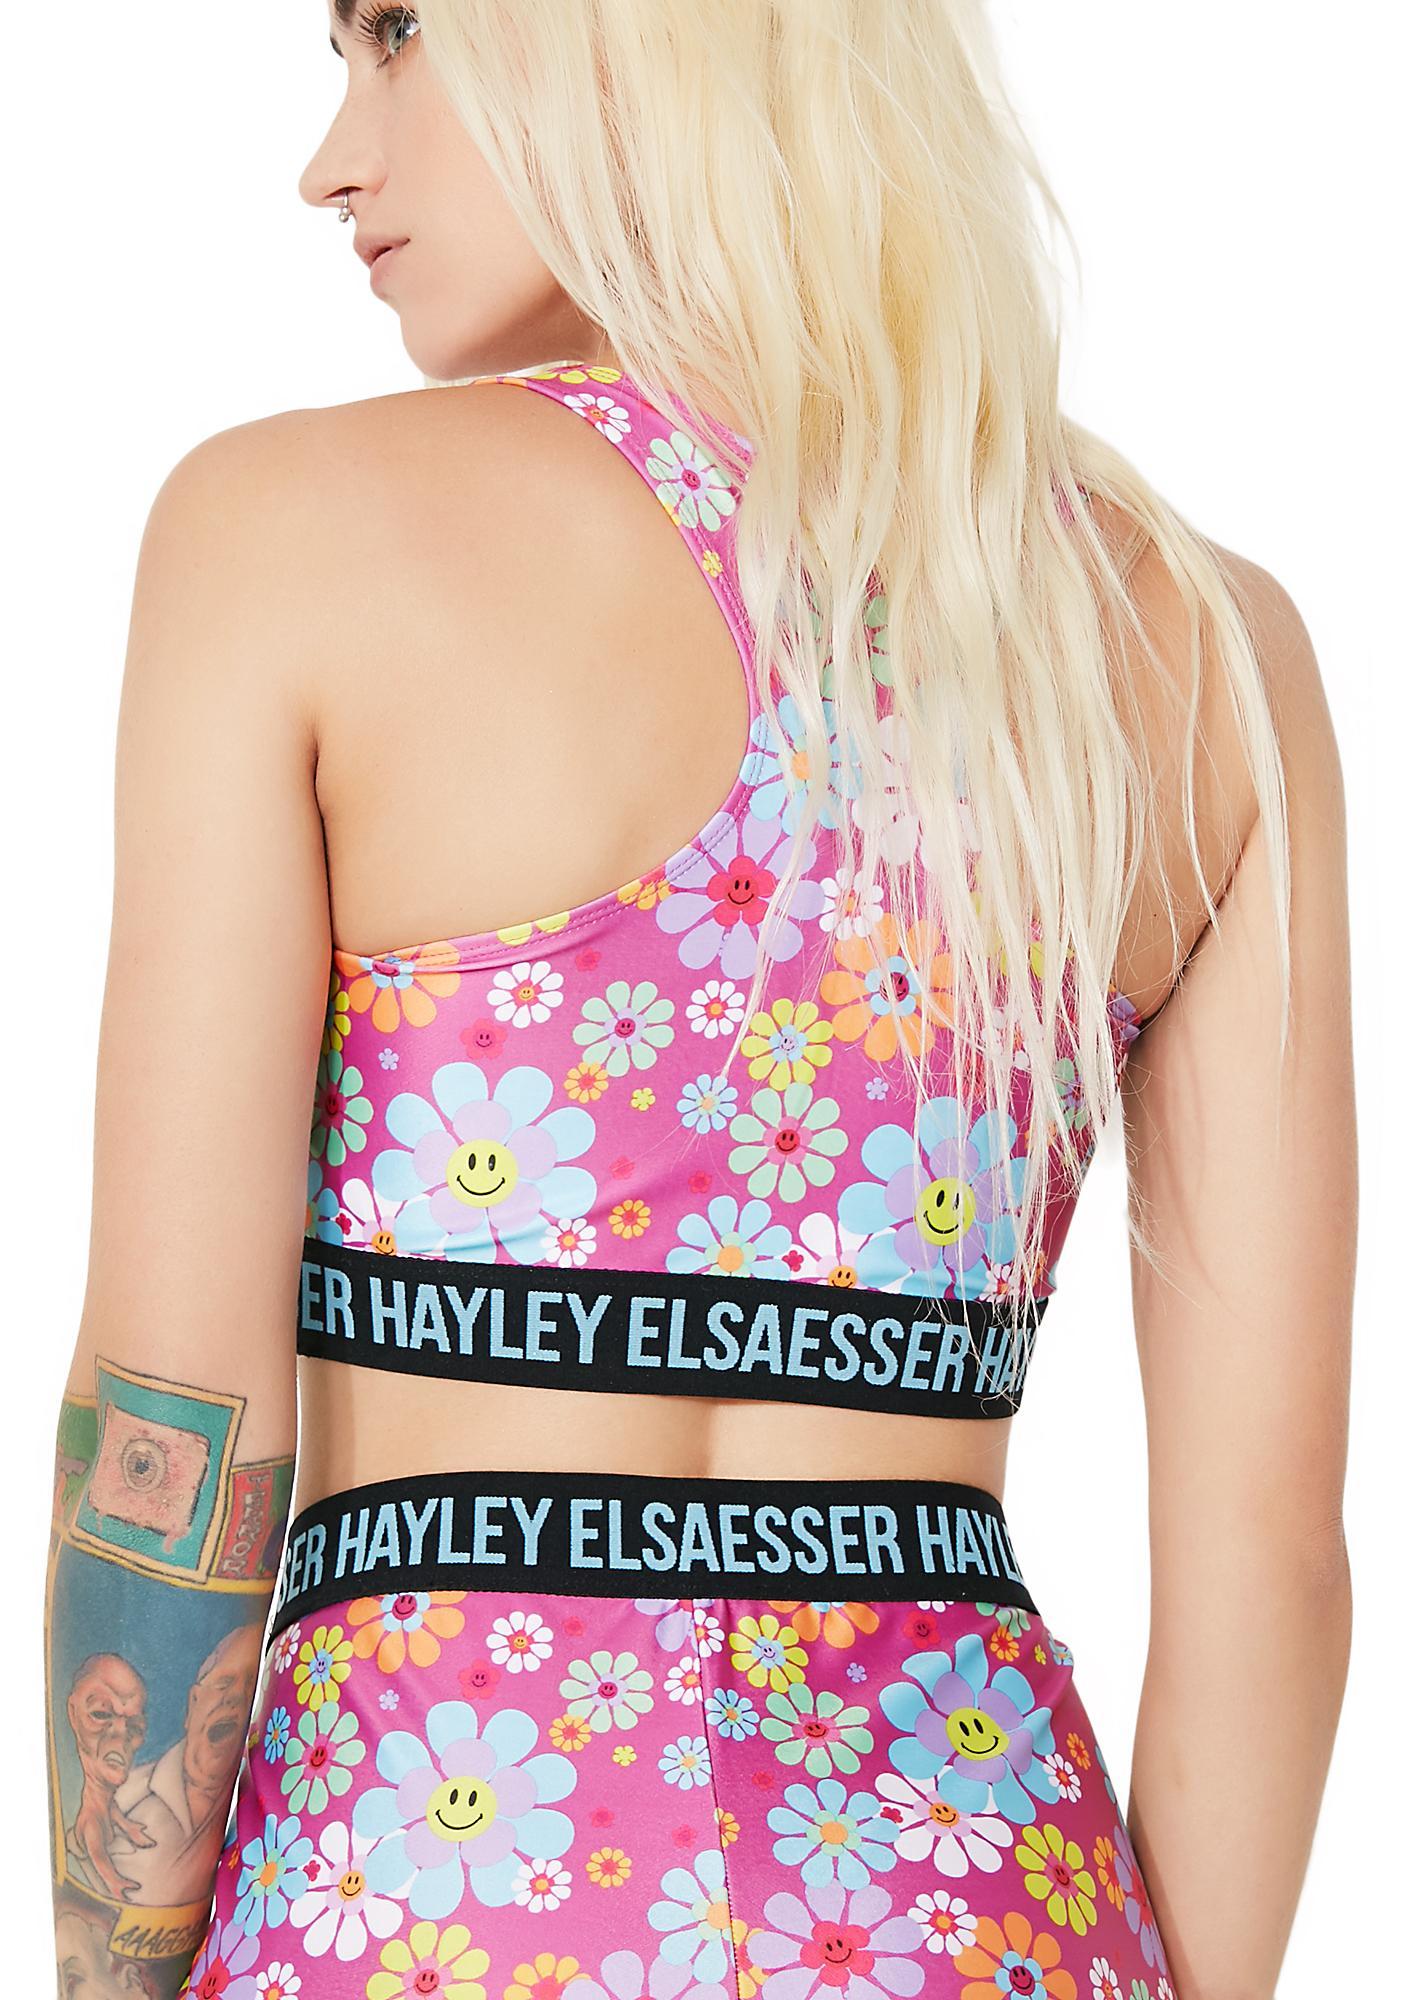 Hayley Elsaesser Flower Smiley Face Sports Bra